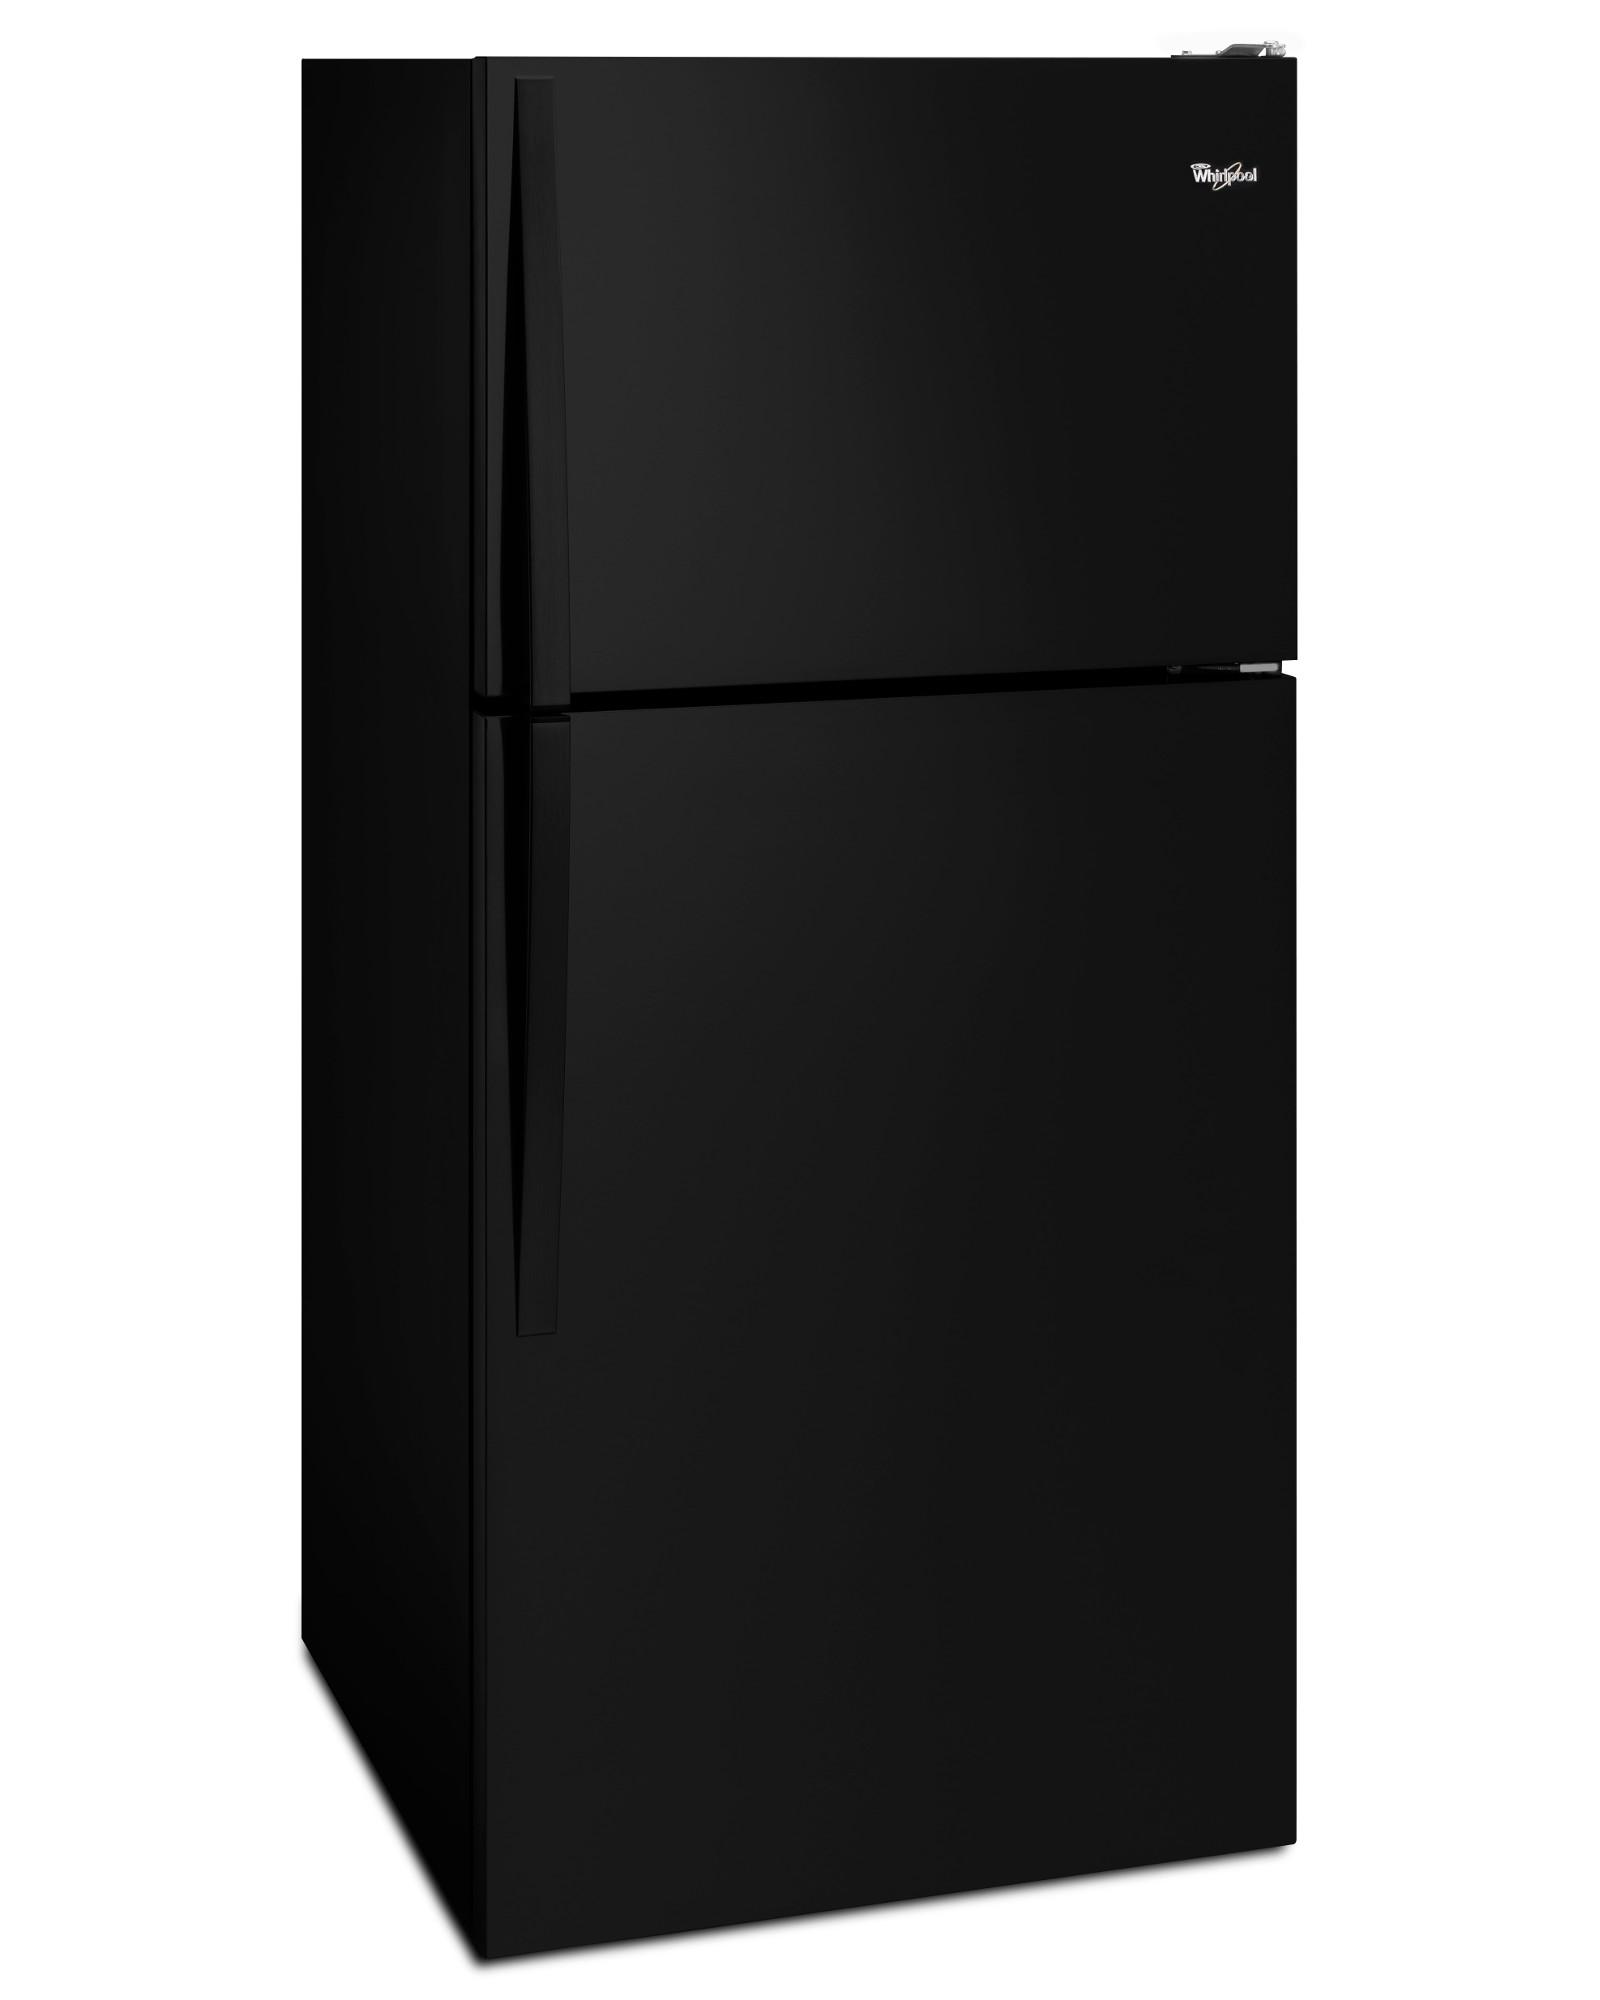 Whirlpool WRT108FZDB 18 cu. ft. Top Freezer Refrigerator  - Black